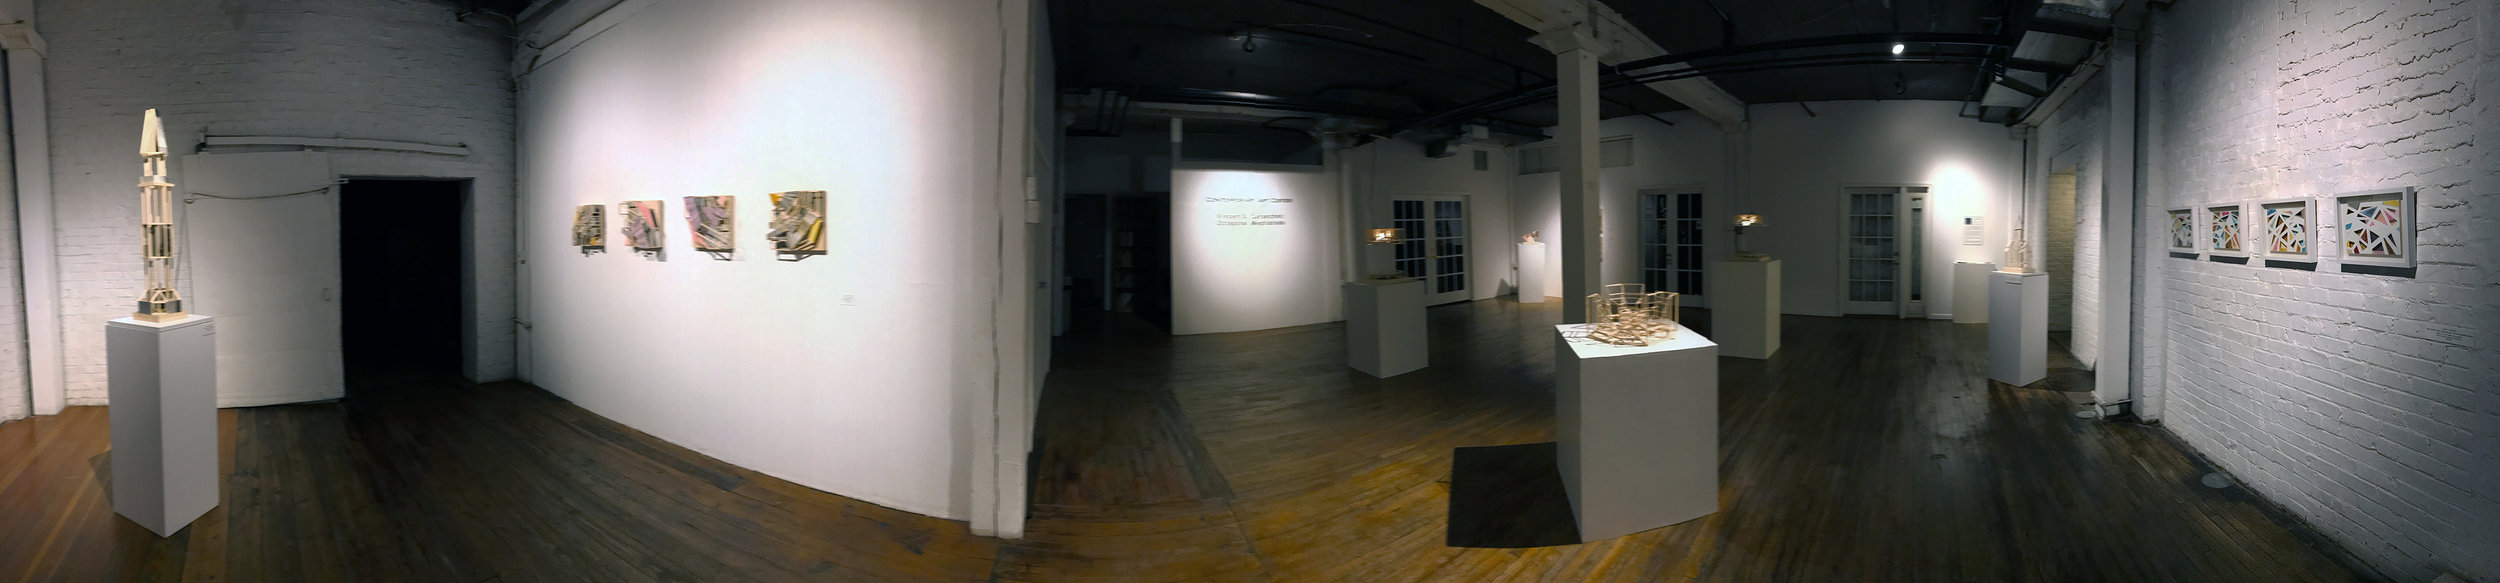 Octagonal Meditations Exhibition